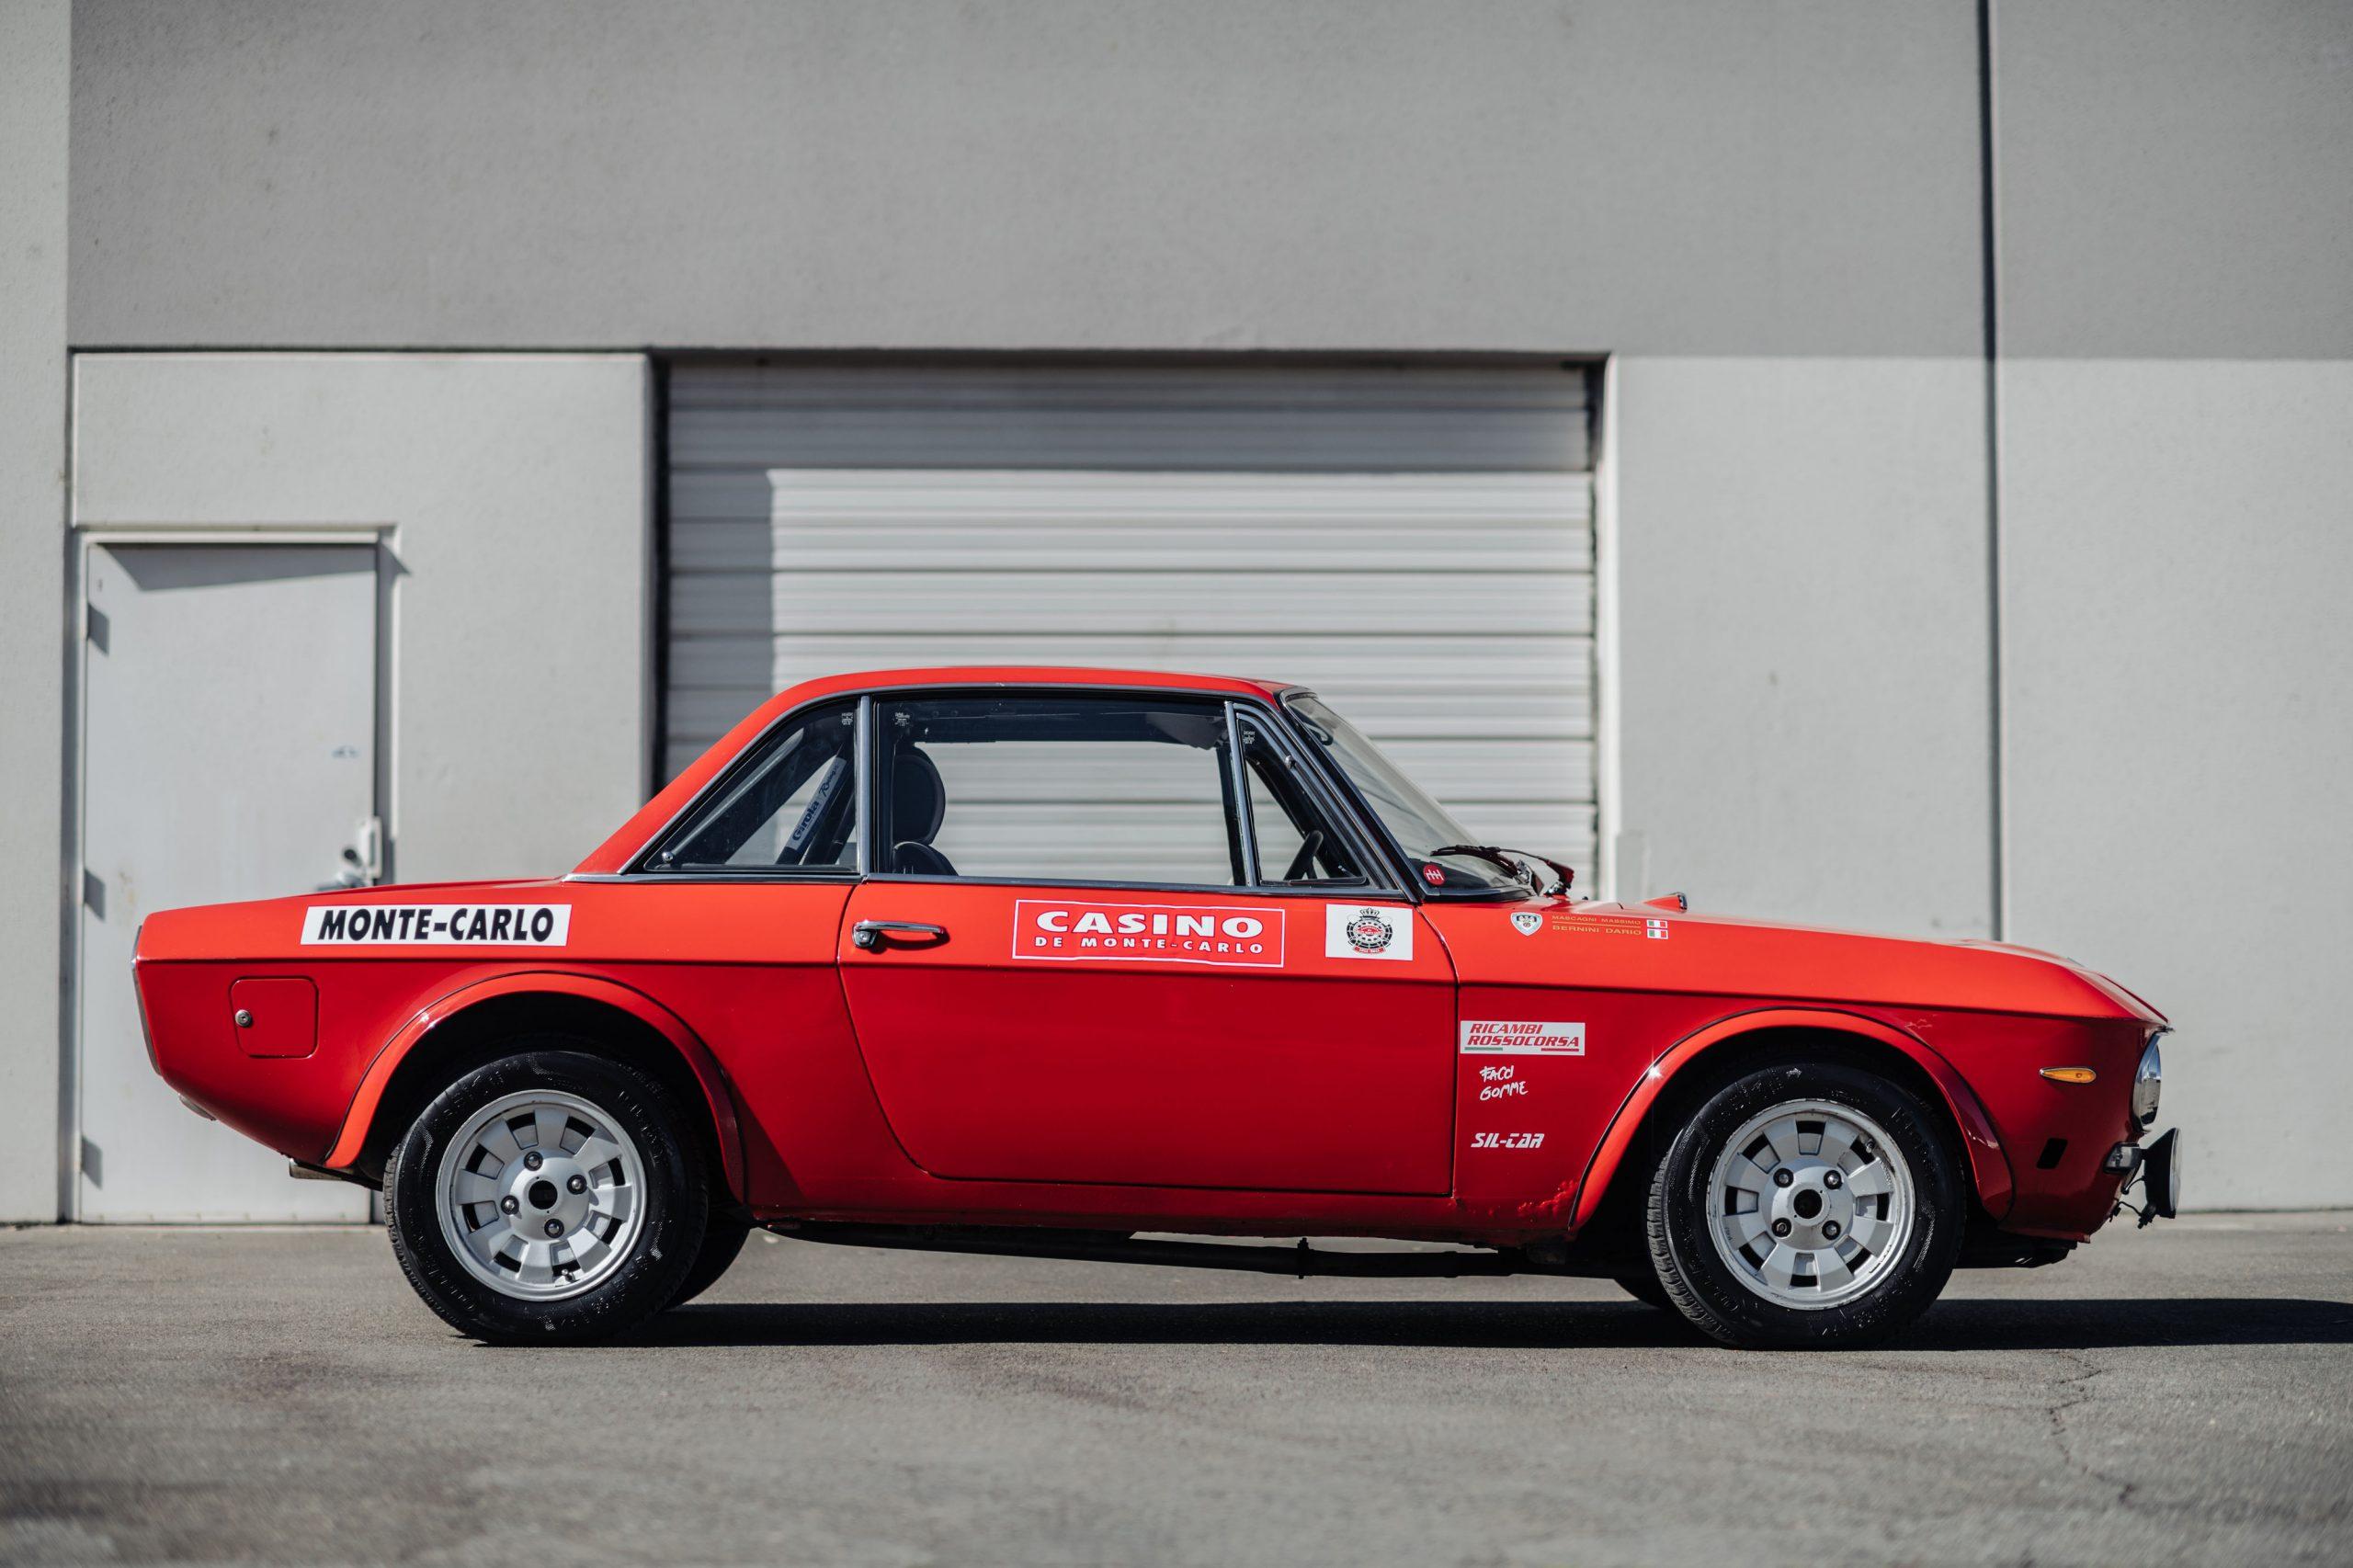 1972 Lancia Fulvia Coupe 1600 HF Series 2 Fanalino side profile